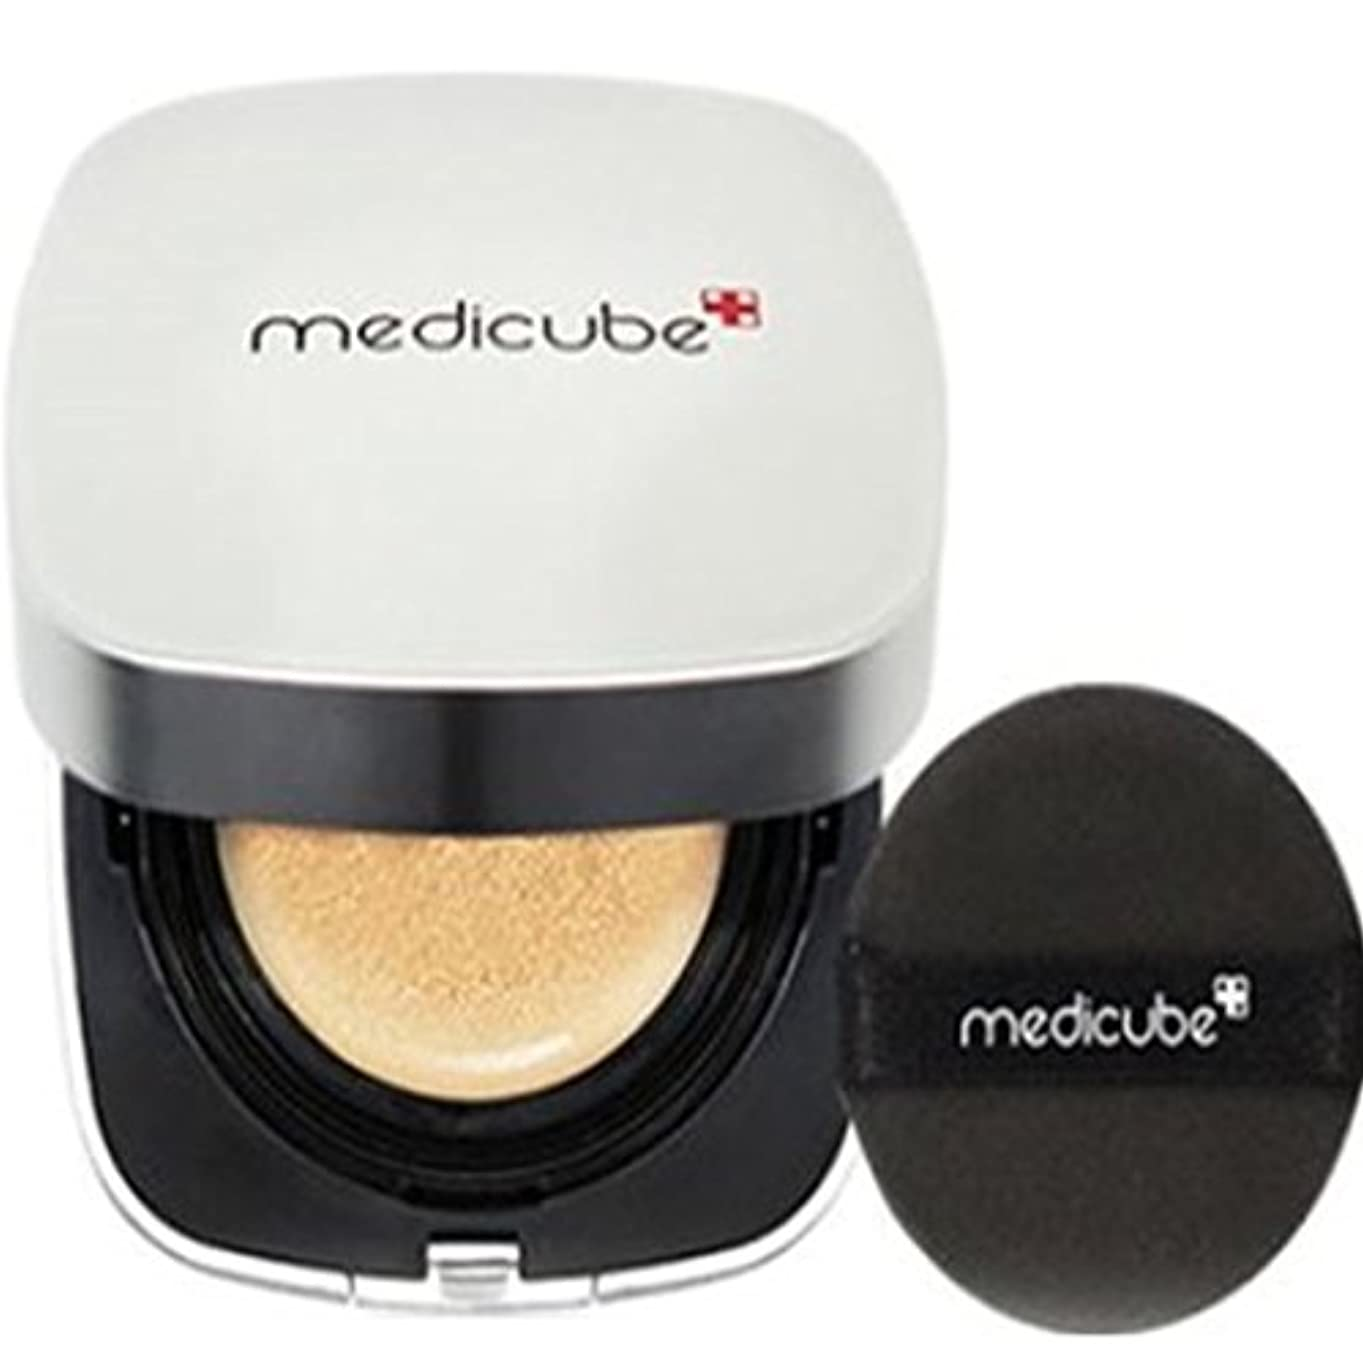 [Medicube メディキューブ] レッドクッション - シェード23号ナチュラルベージュ / Red Cushion - Shade 23 Natural Beige [並行輸入品]